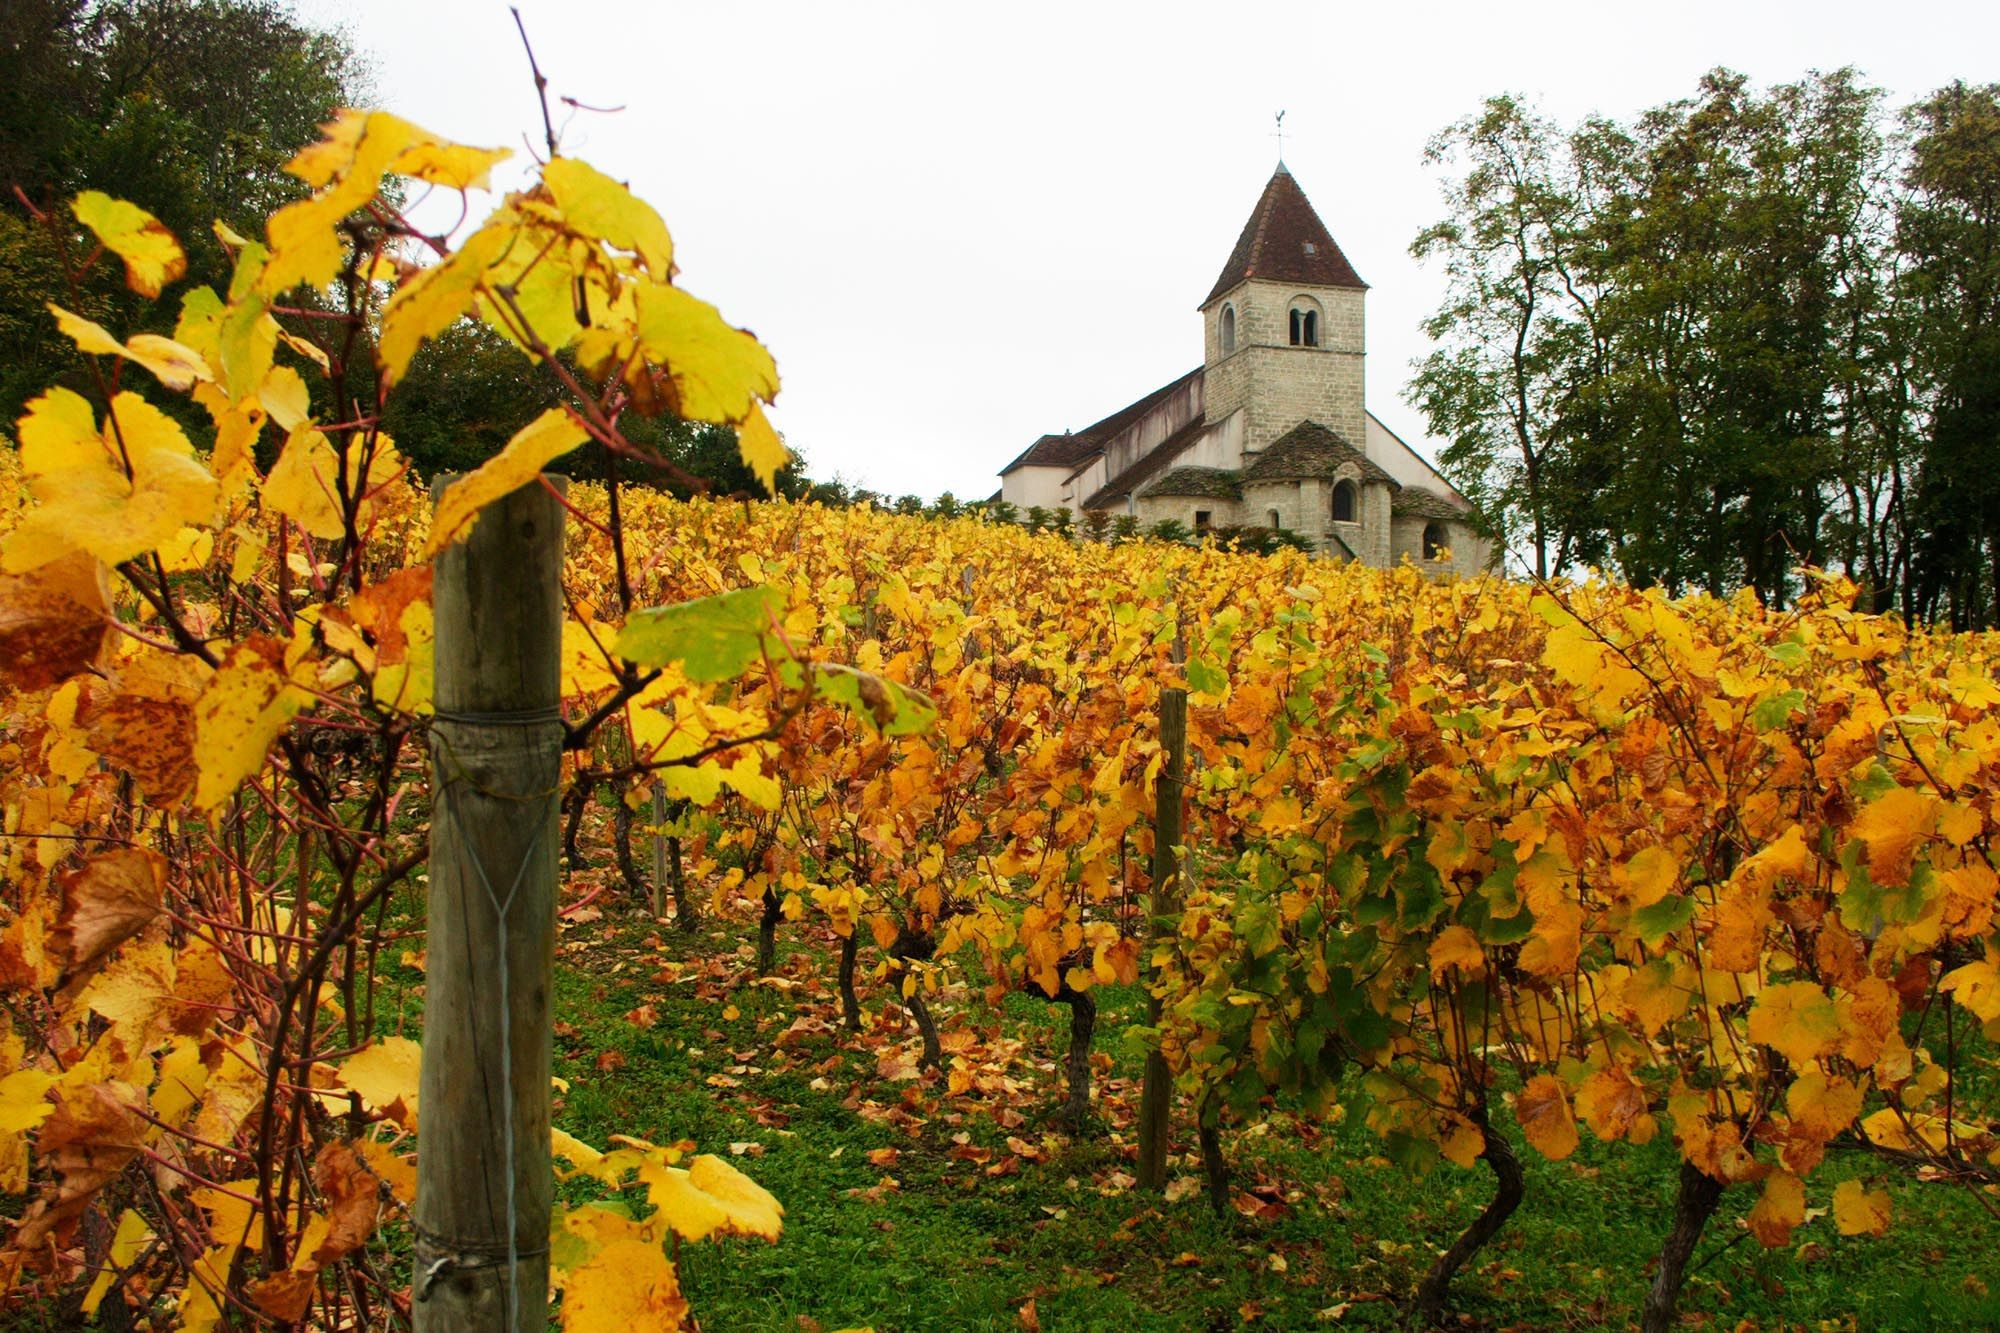 Vignoble Bourgogne Côte d'Or Vineyard, Grape vines, Cahors